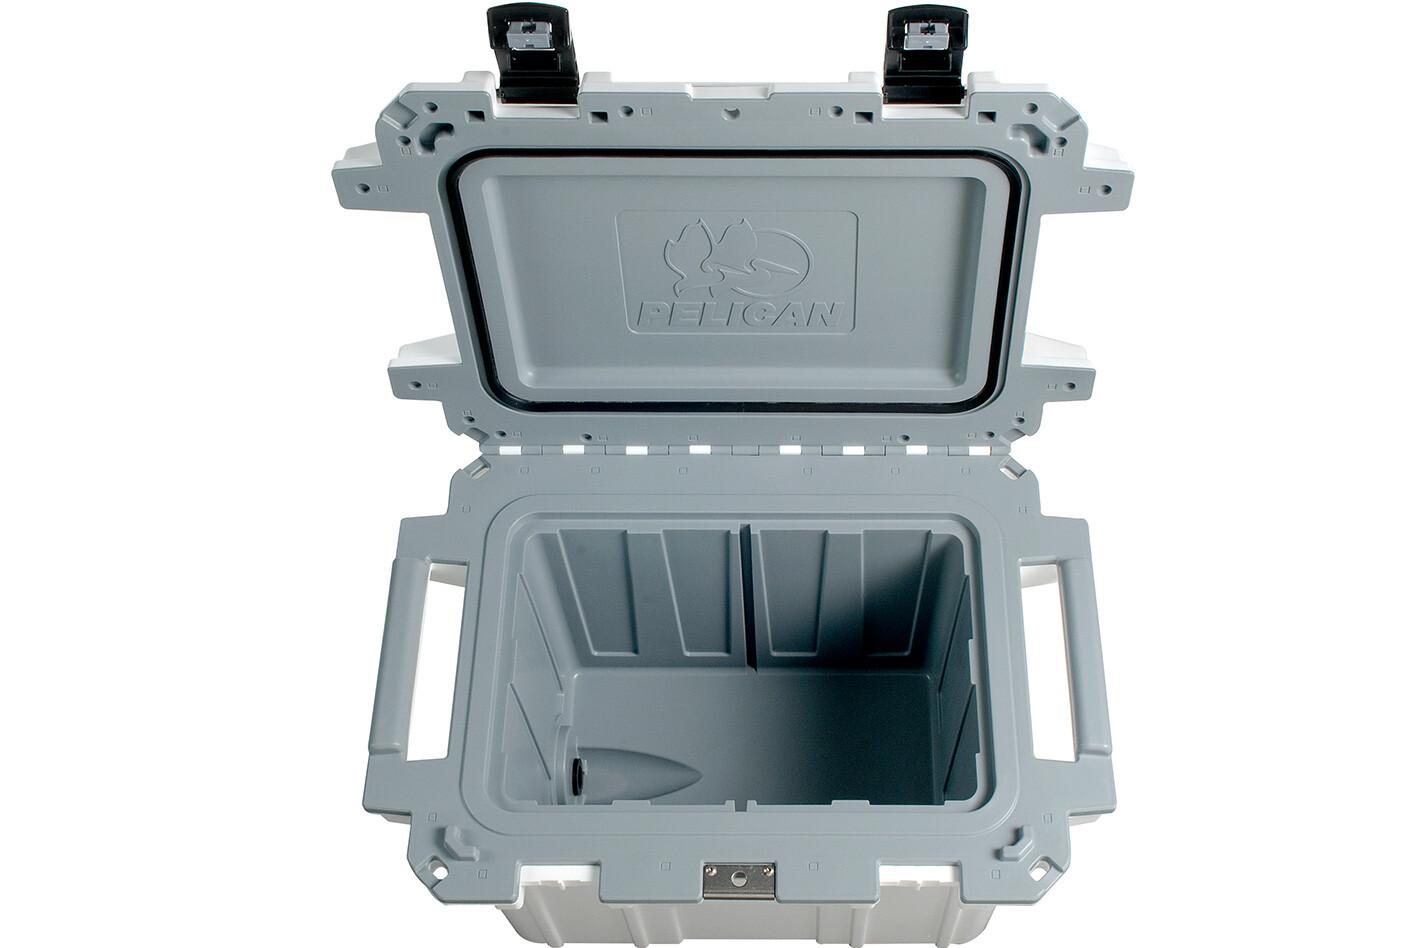 Pelican-50QT-Elite-Coolers.jpg